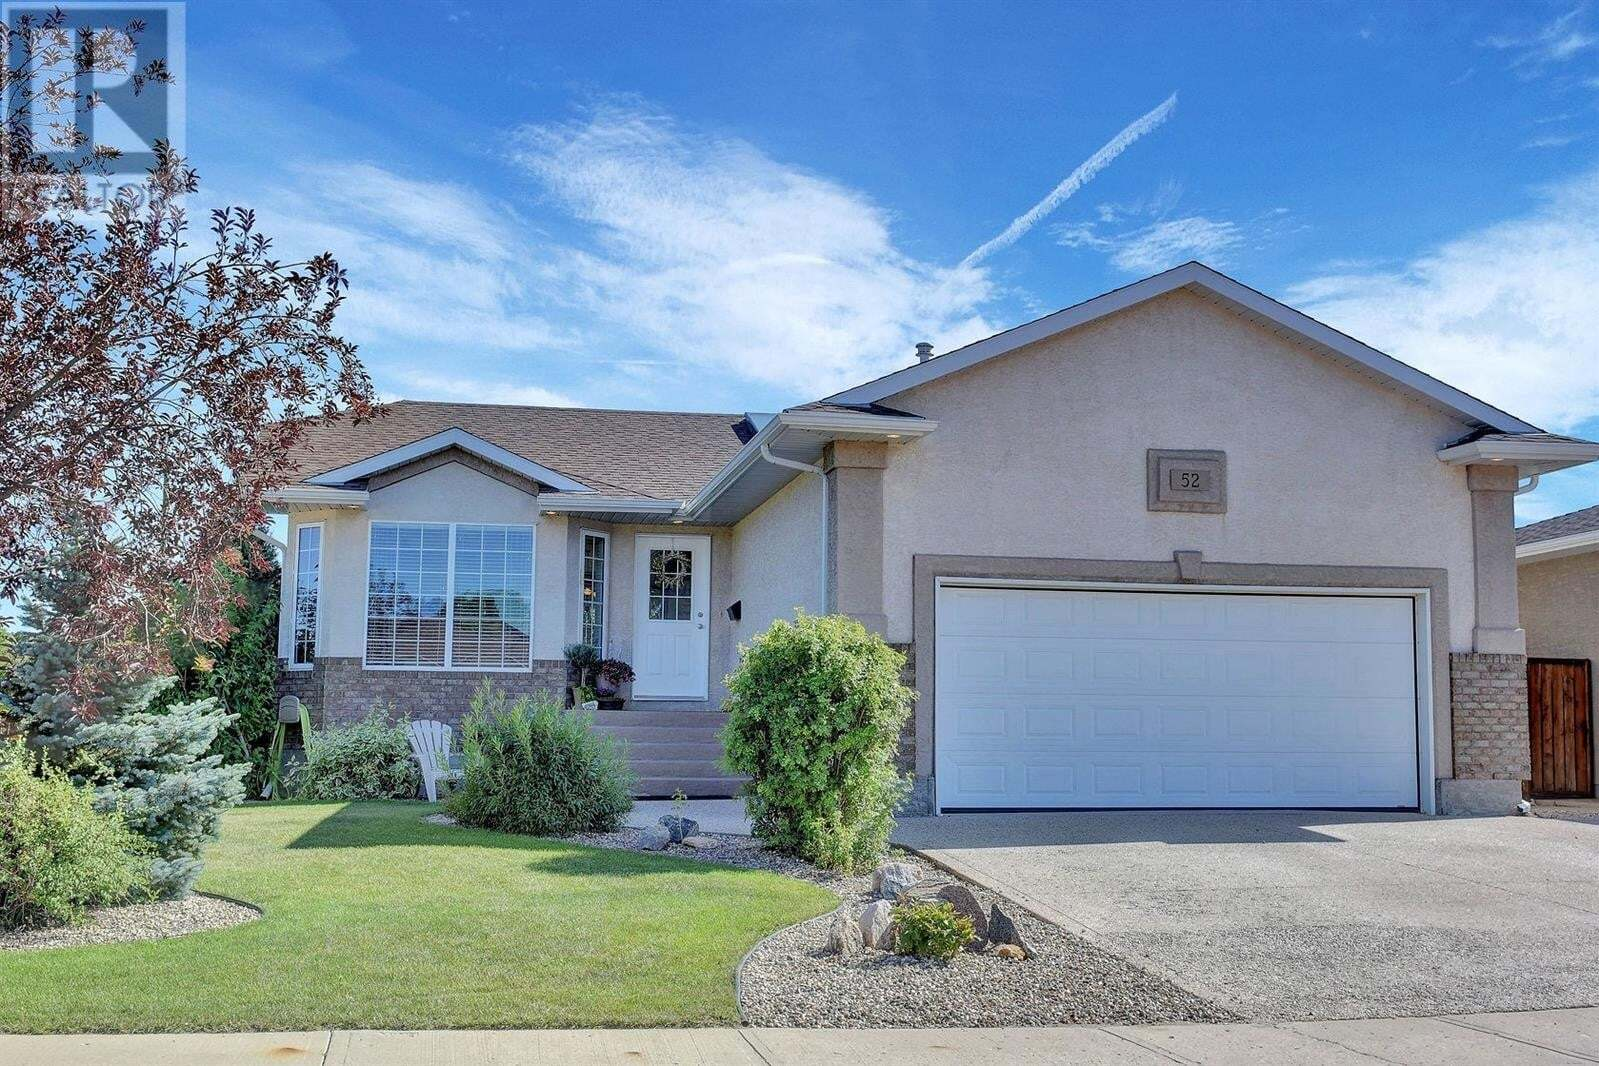 House for sale at 52 Kalmia Cres Moose Jaw Saskatchewan - MLS: SK820819